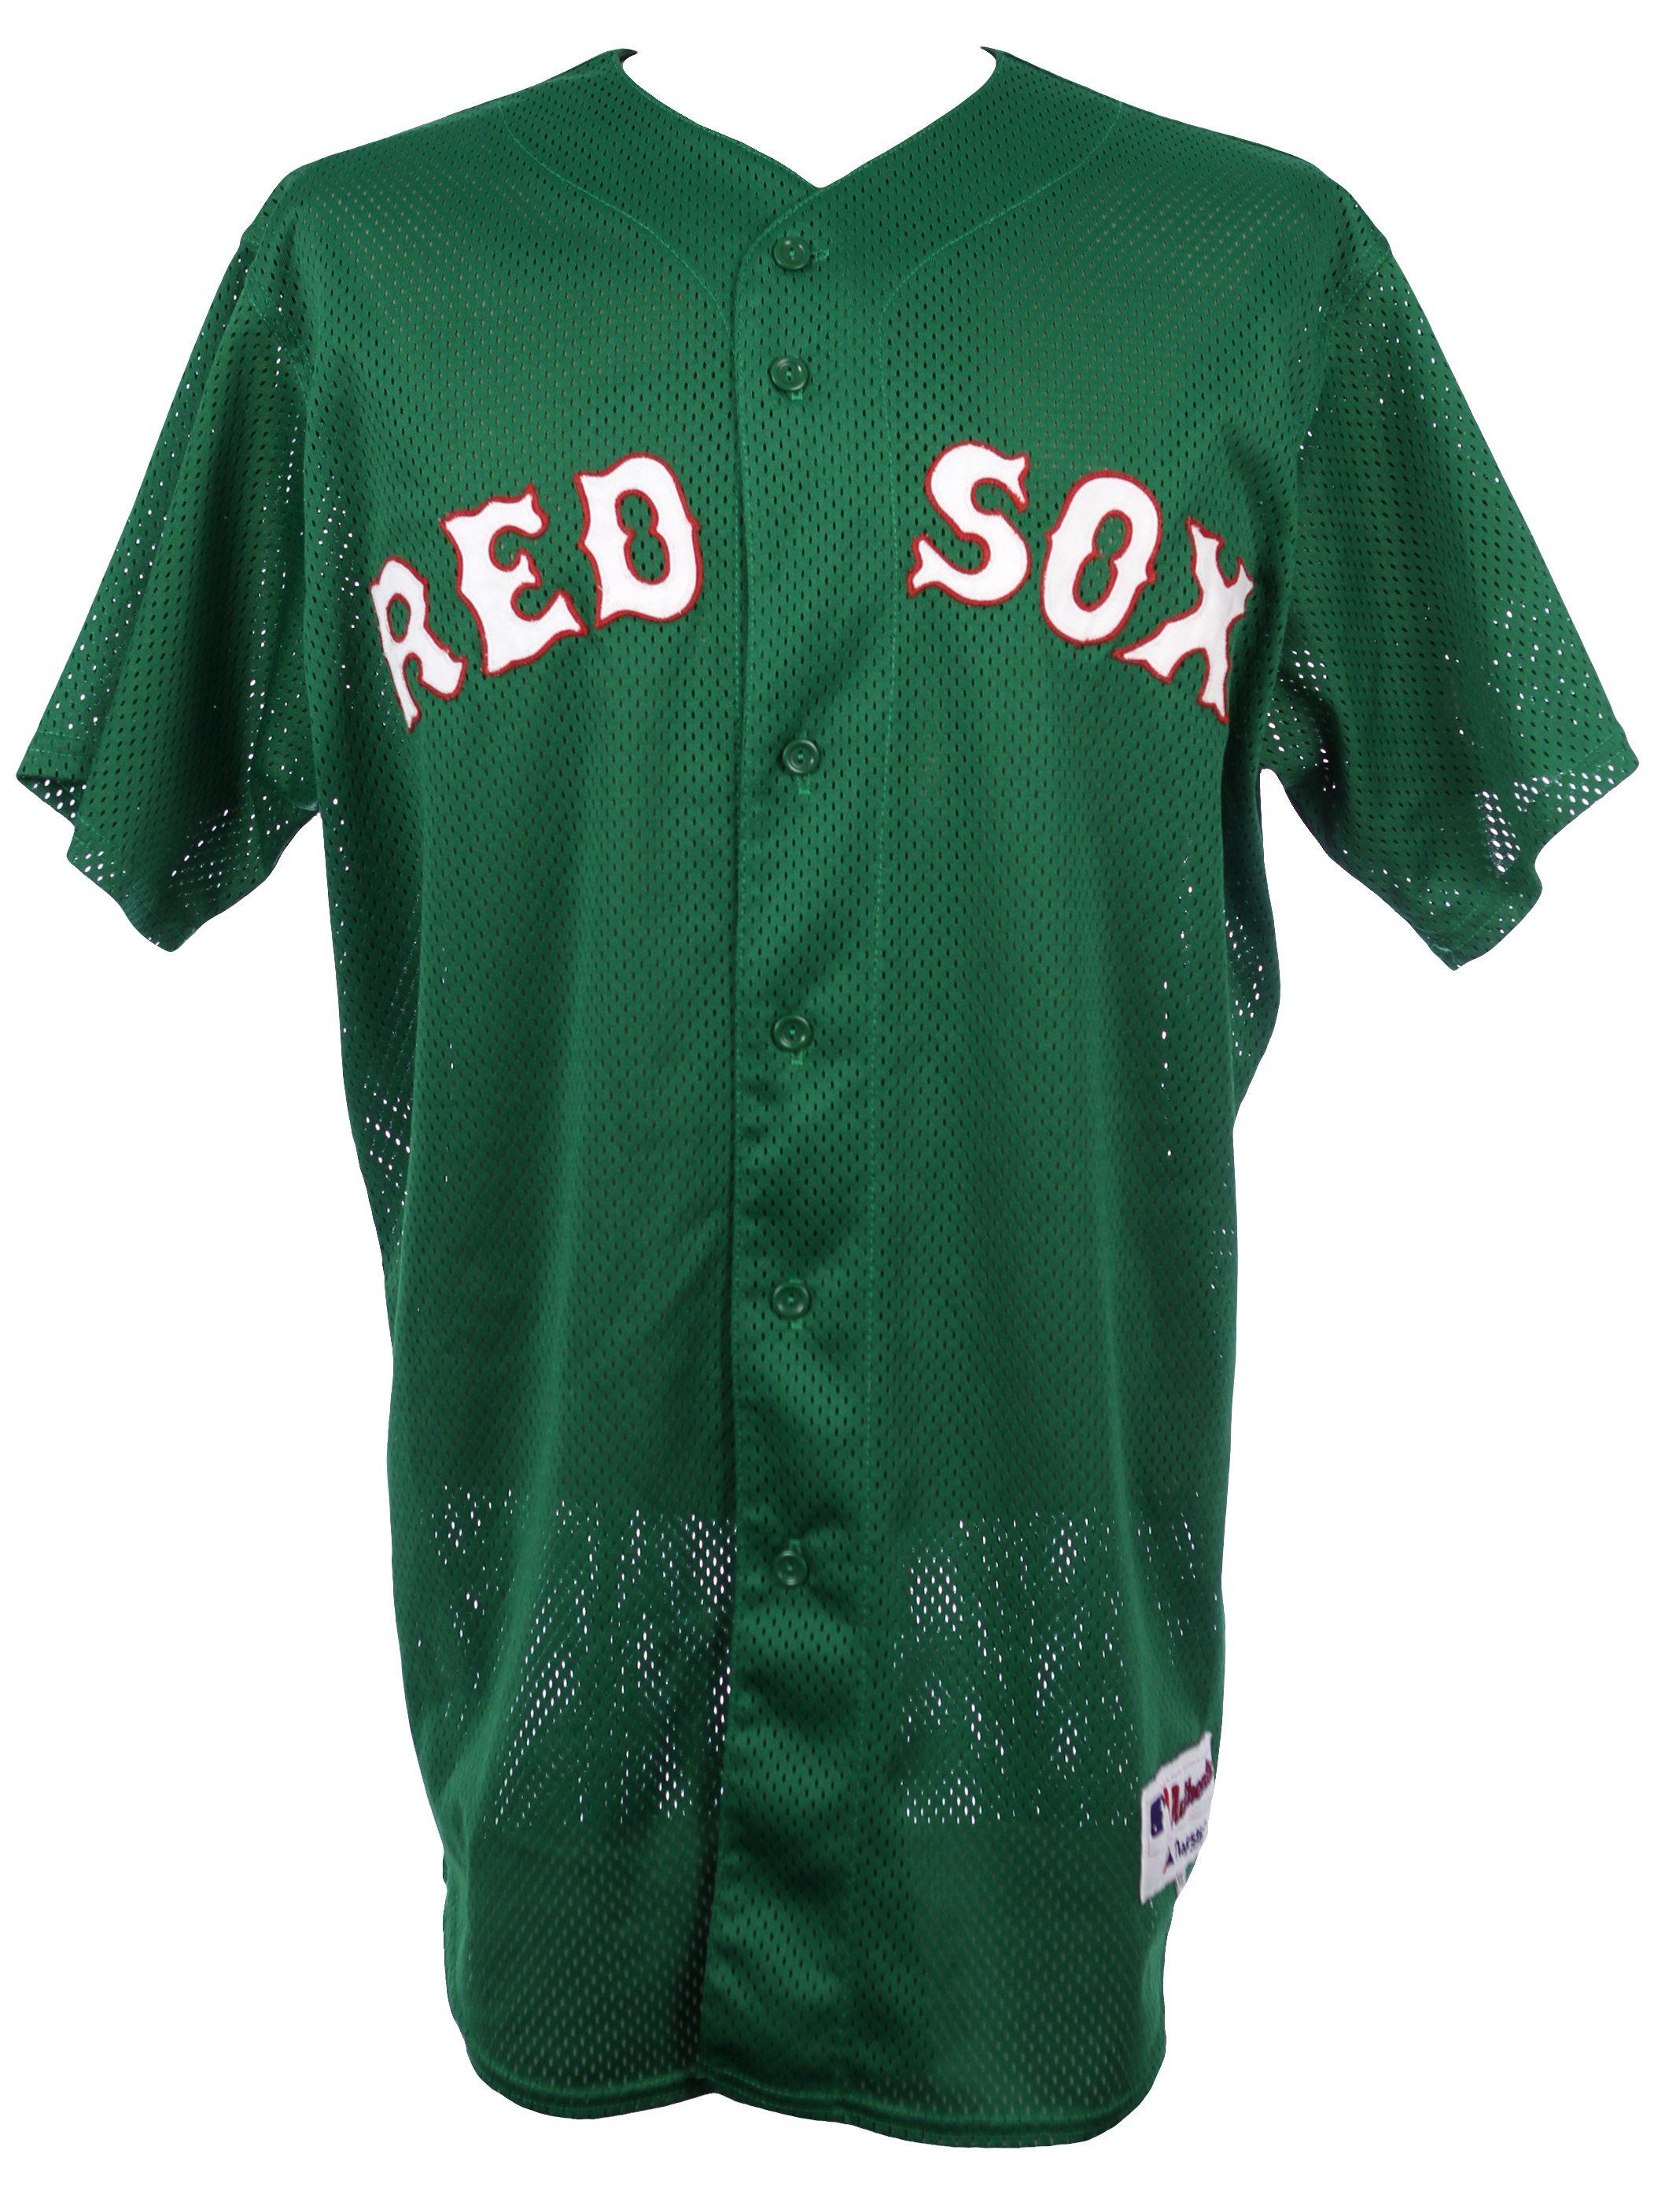 buy online 8417f 9bcf8 Lot Detail - 2005 Edgar Renteria Boston Red Sox Game Worn St ...